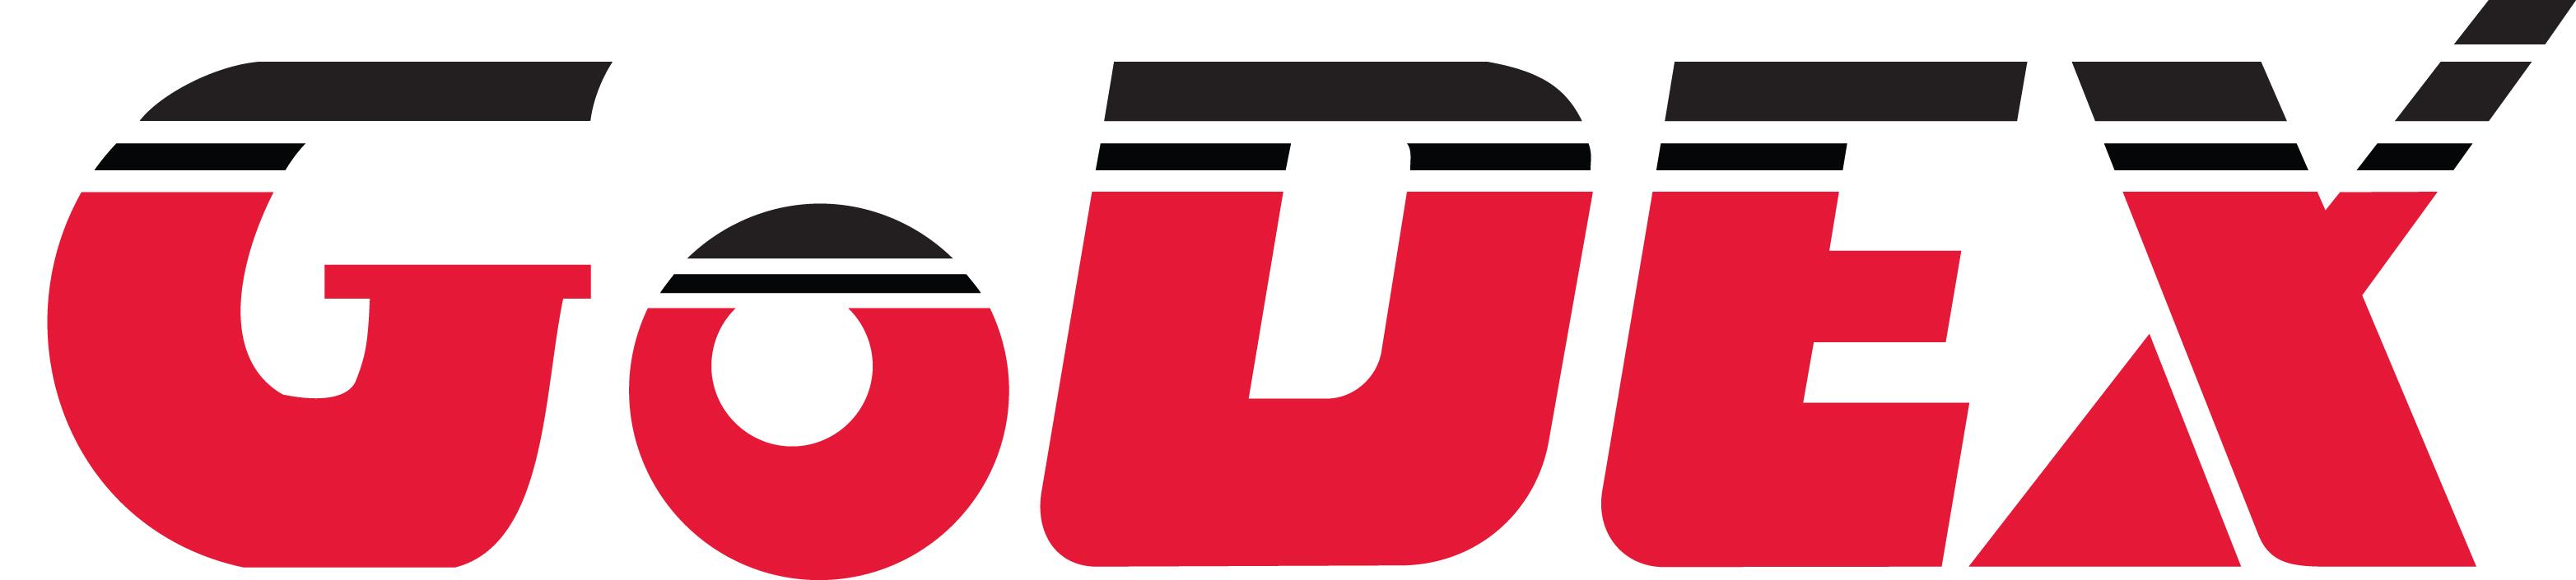 GoDEX-new-logo